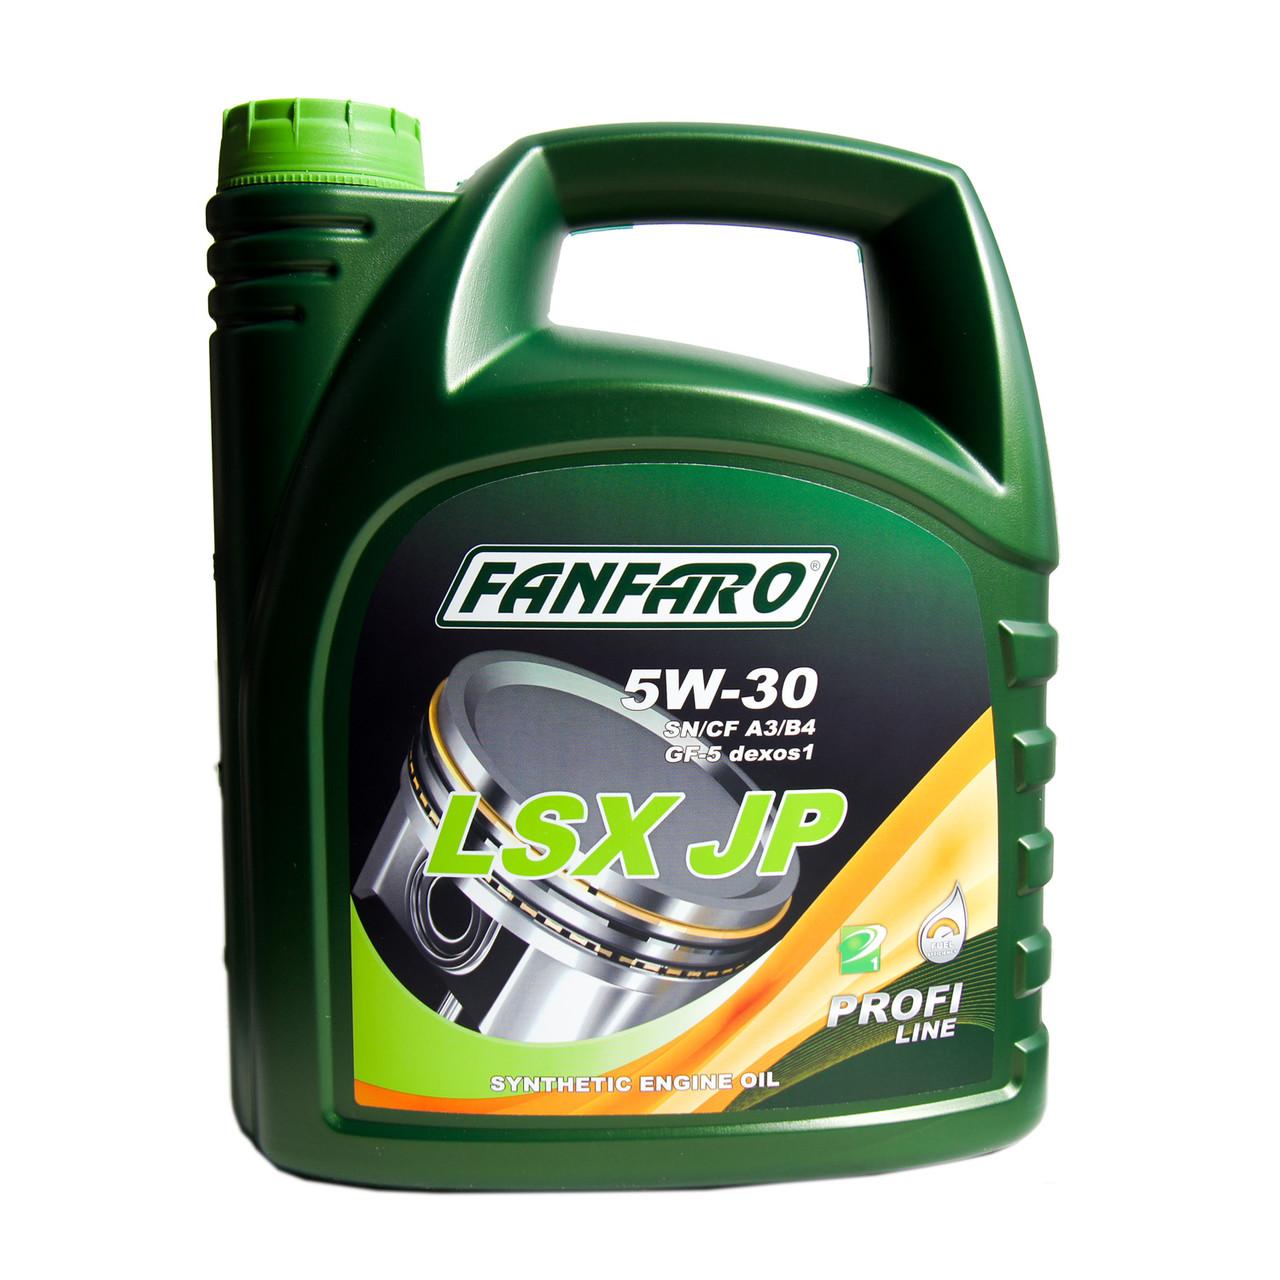 FANFARO Моторное масло LSX JP SAE 5w30 4л Full-synthetic